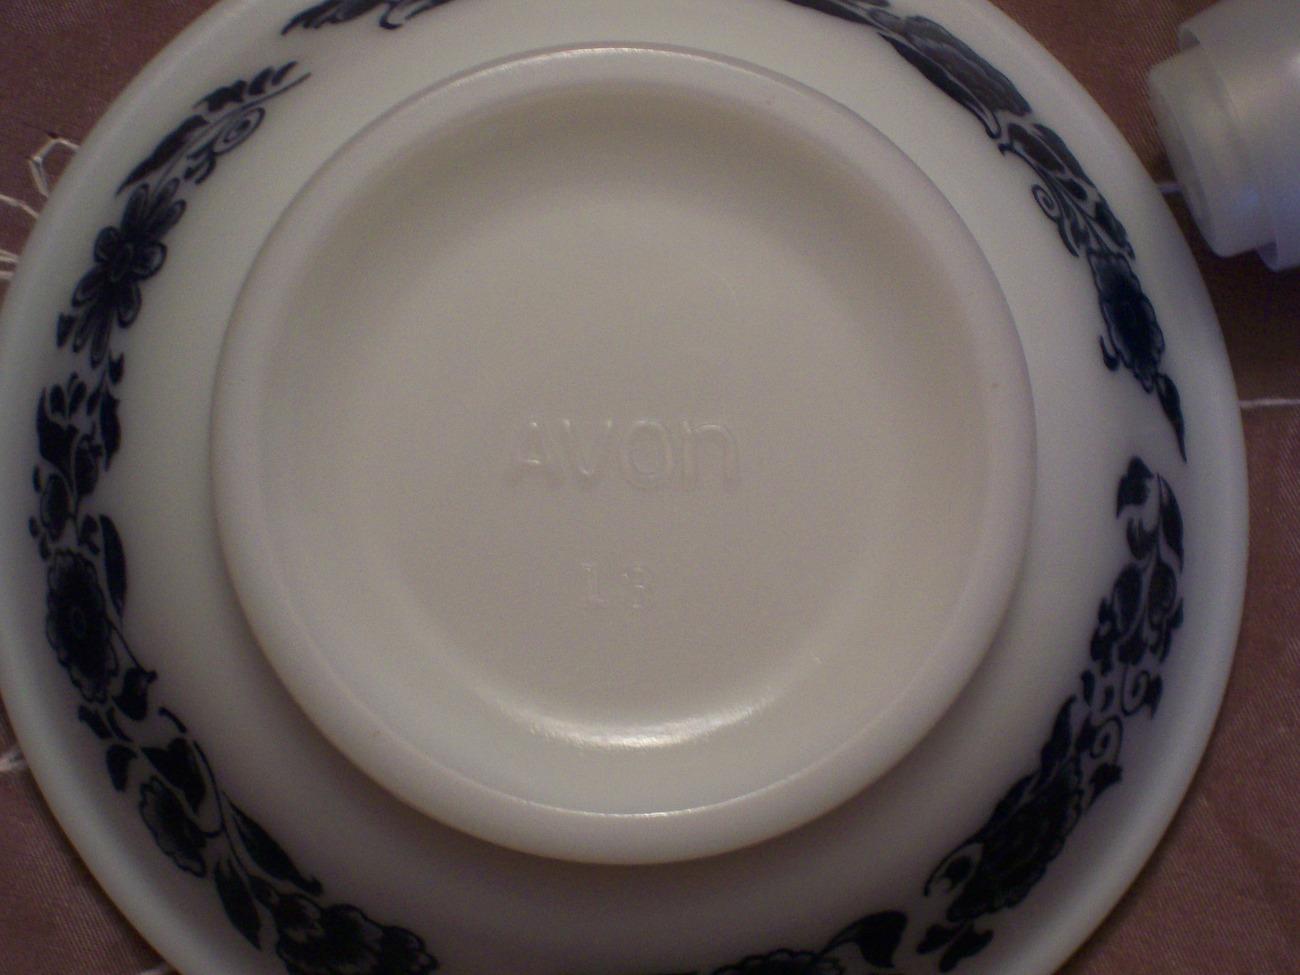 Collectible Vintage Avon Delft Blue and White Pitcher & Bowl Set- EUC image 3